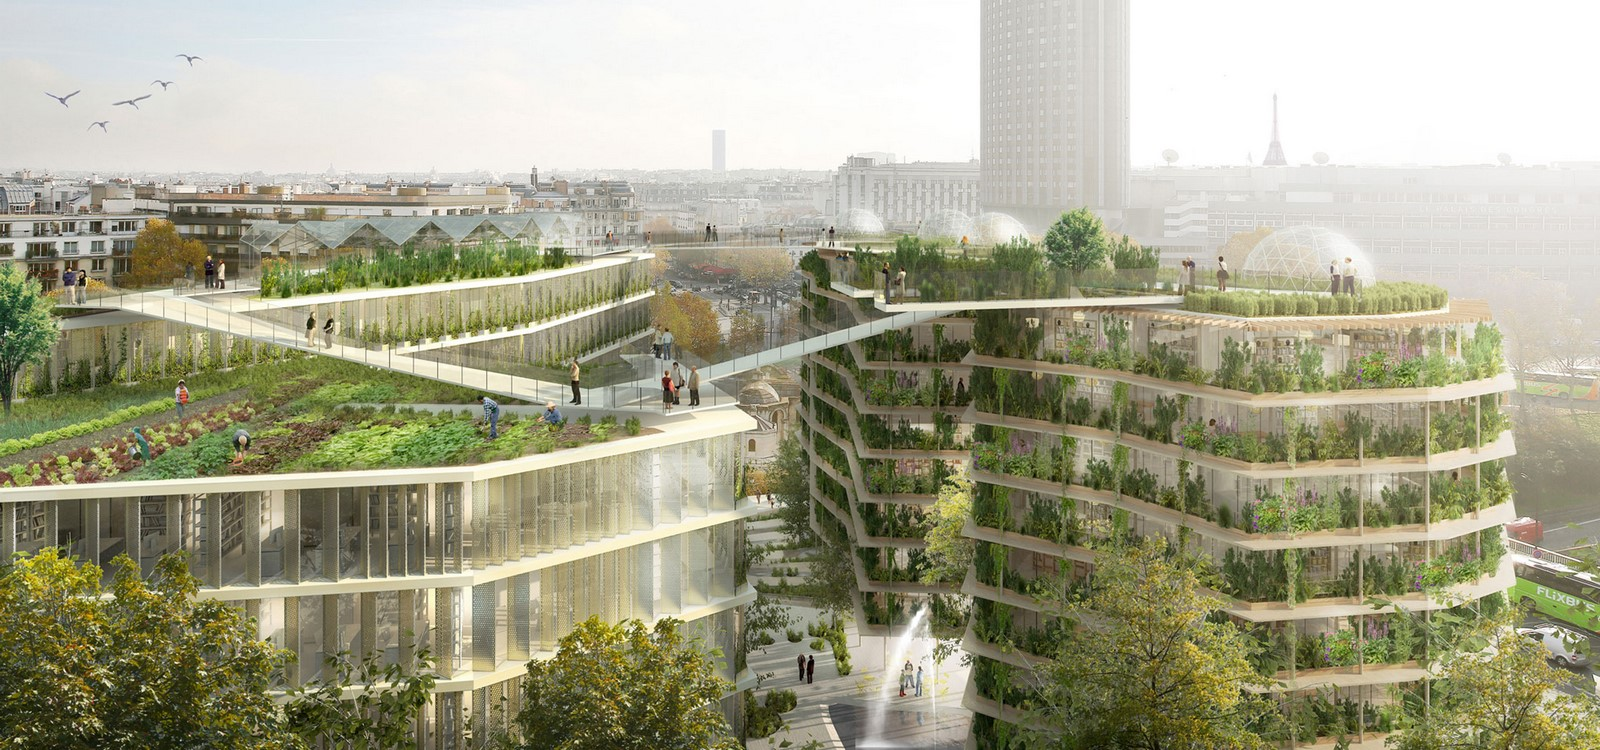 Reinvent Paris - Sheet1